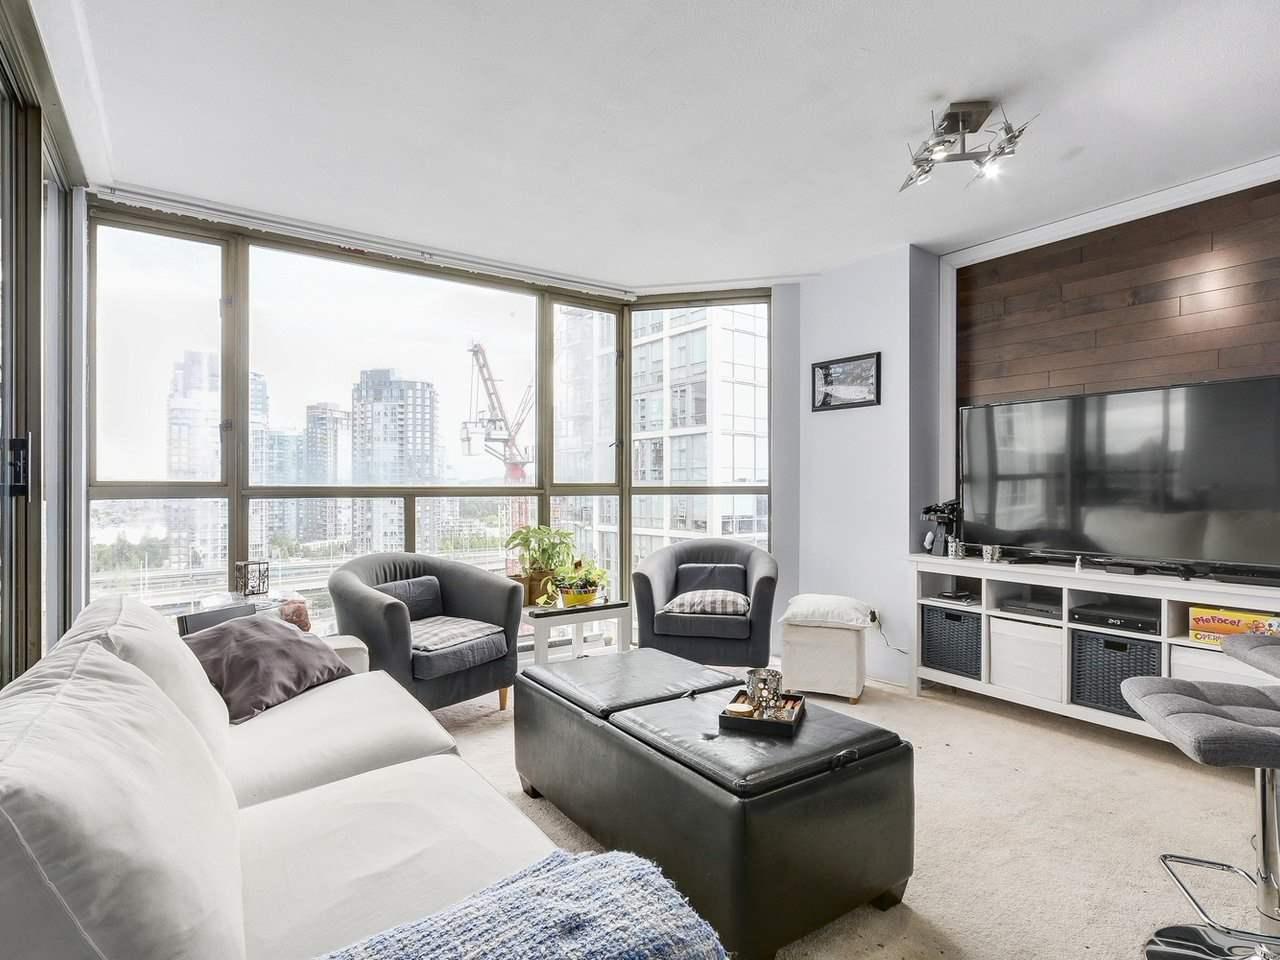 Condo Apartment at 1202 888 PACIFIC STREET, Unit 1202, Vancouver West, British Columbia. Image 2